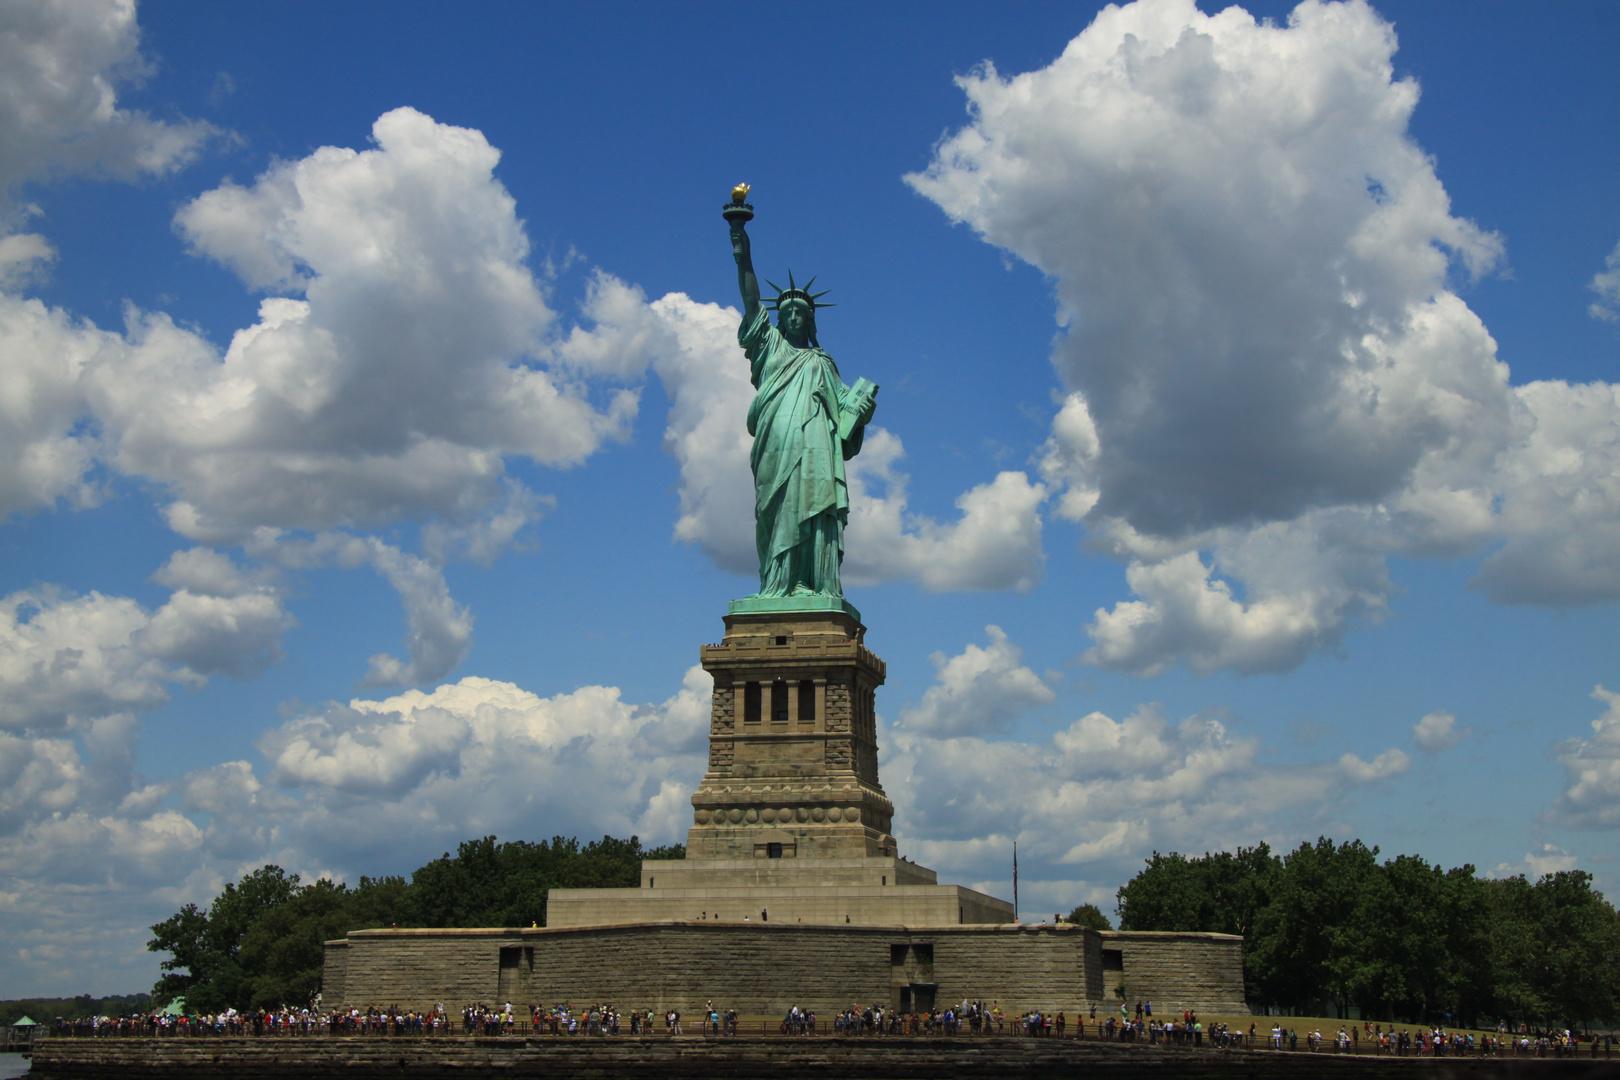 New York! New York! 4